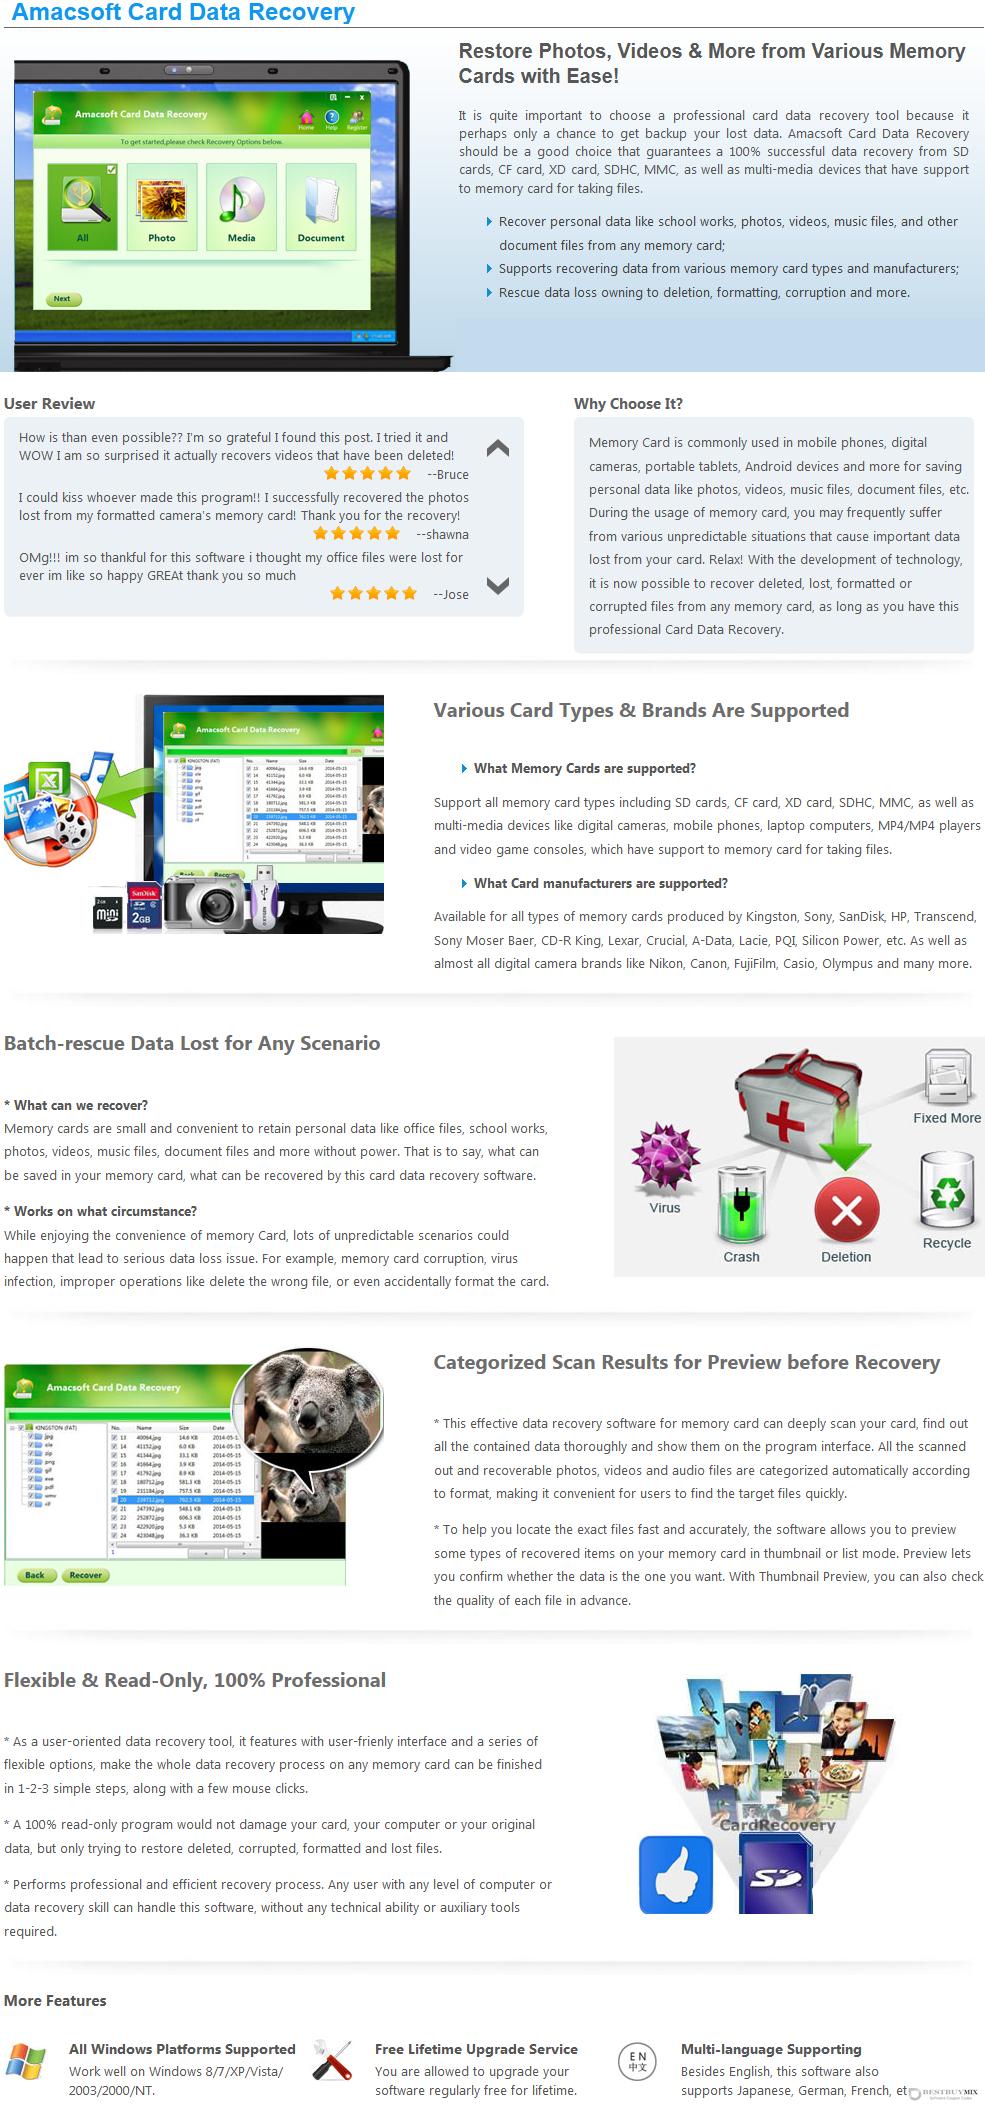 Amacsoft Card Data Recovery Discount Coupon Code